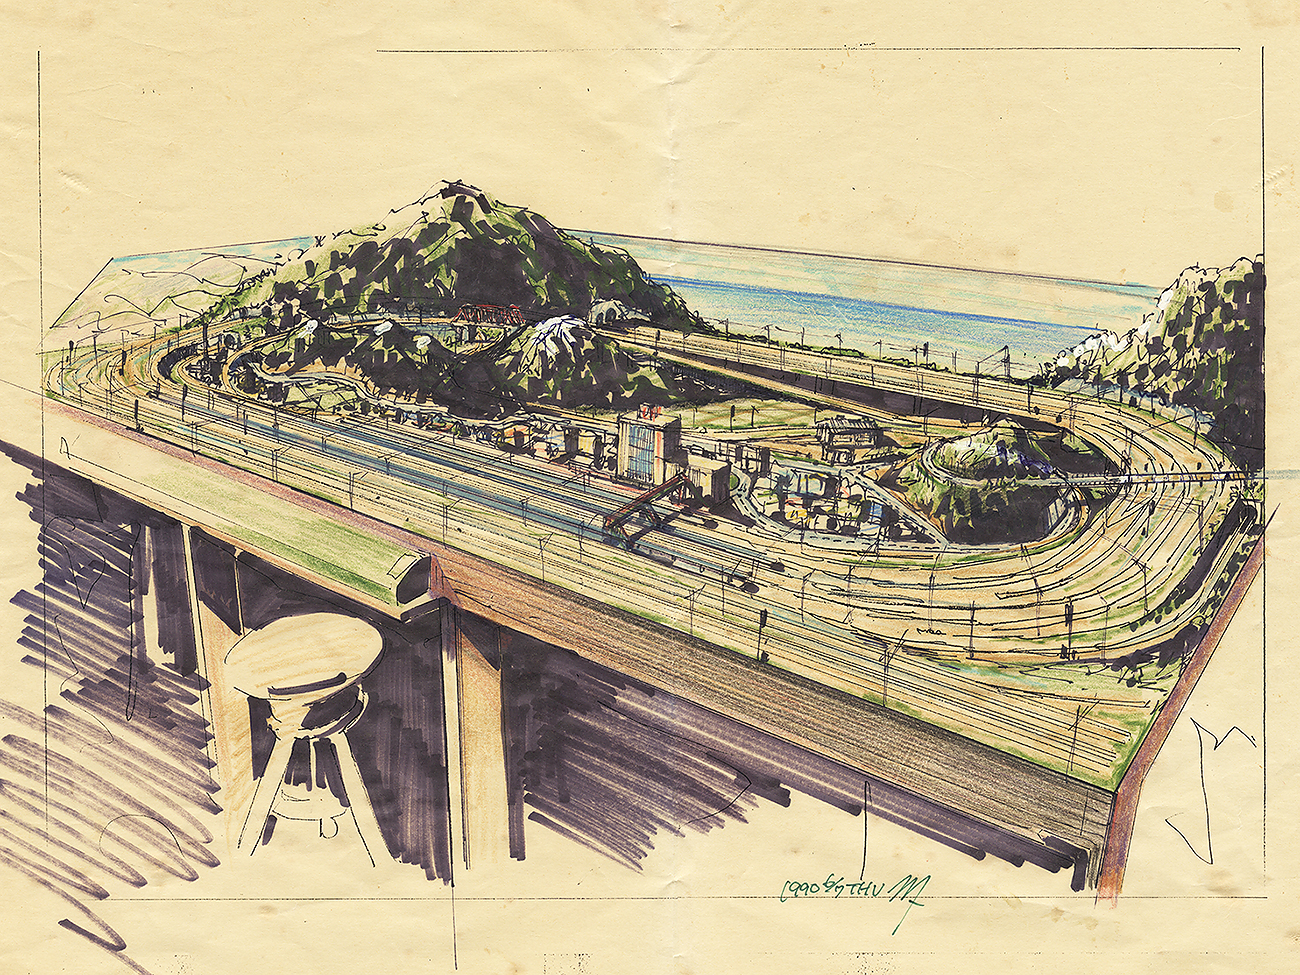 http://moritetsu.info/model-railway/img/w04lion-n001.jpg